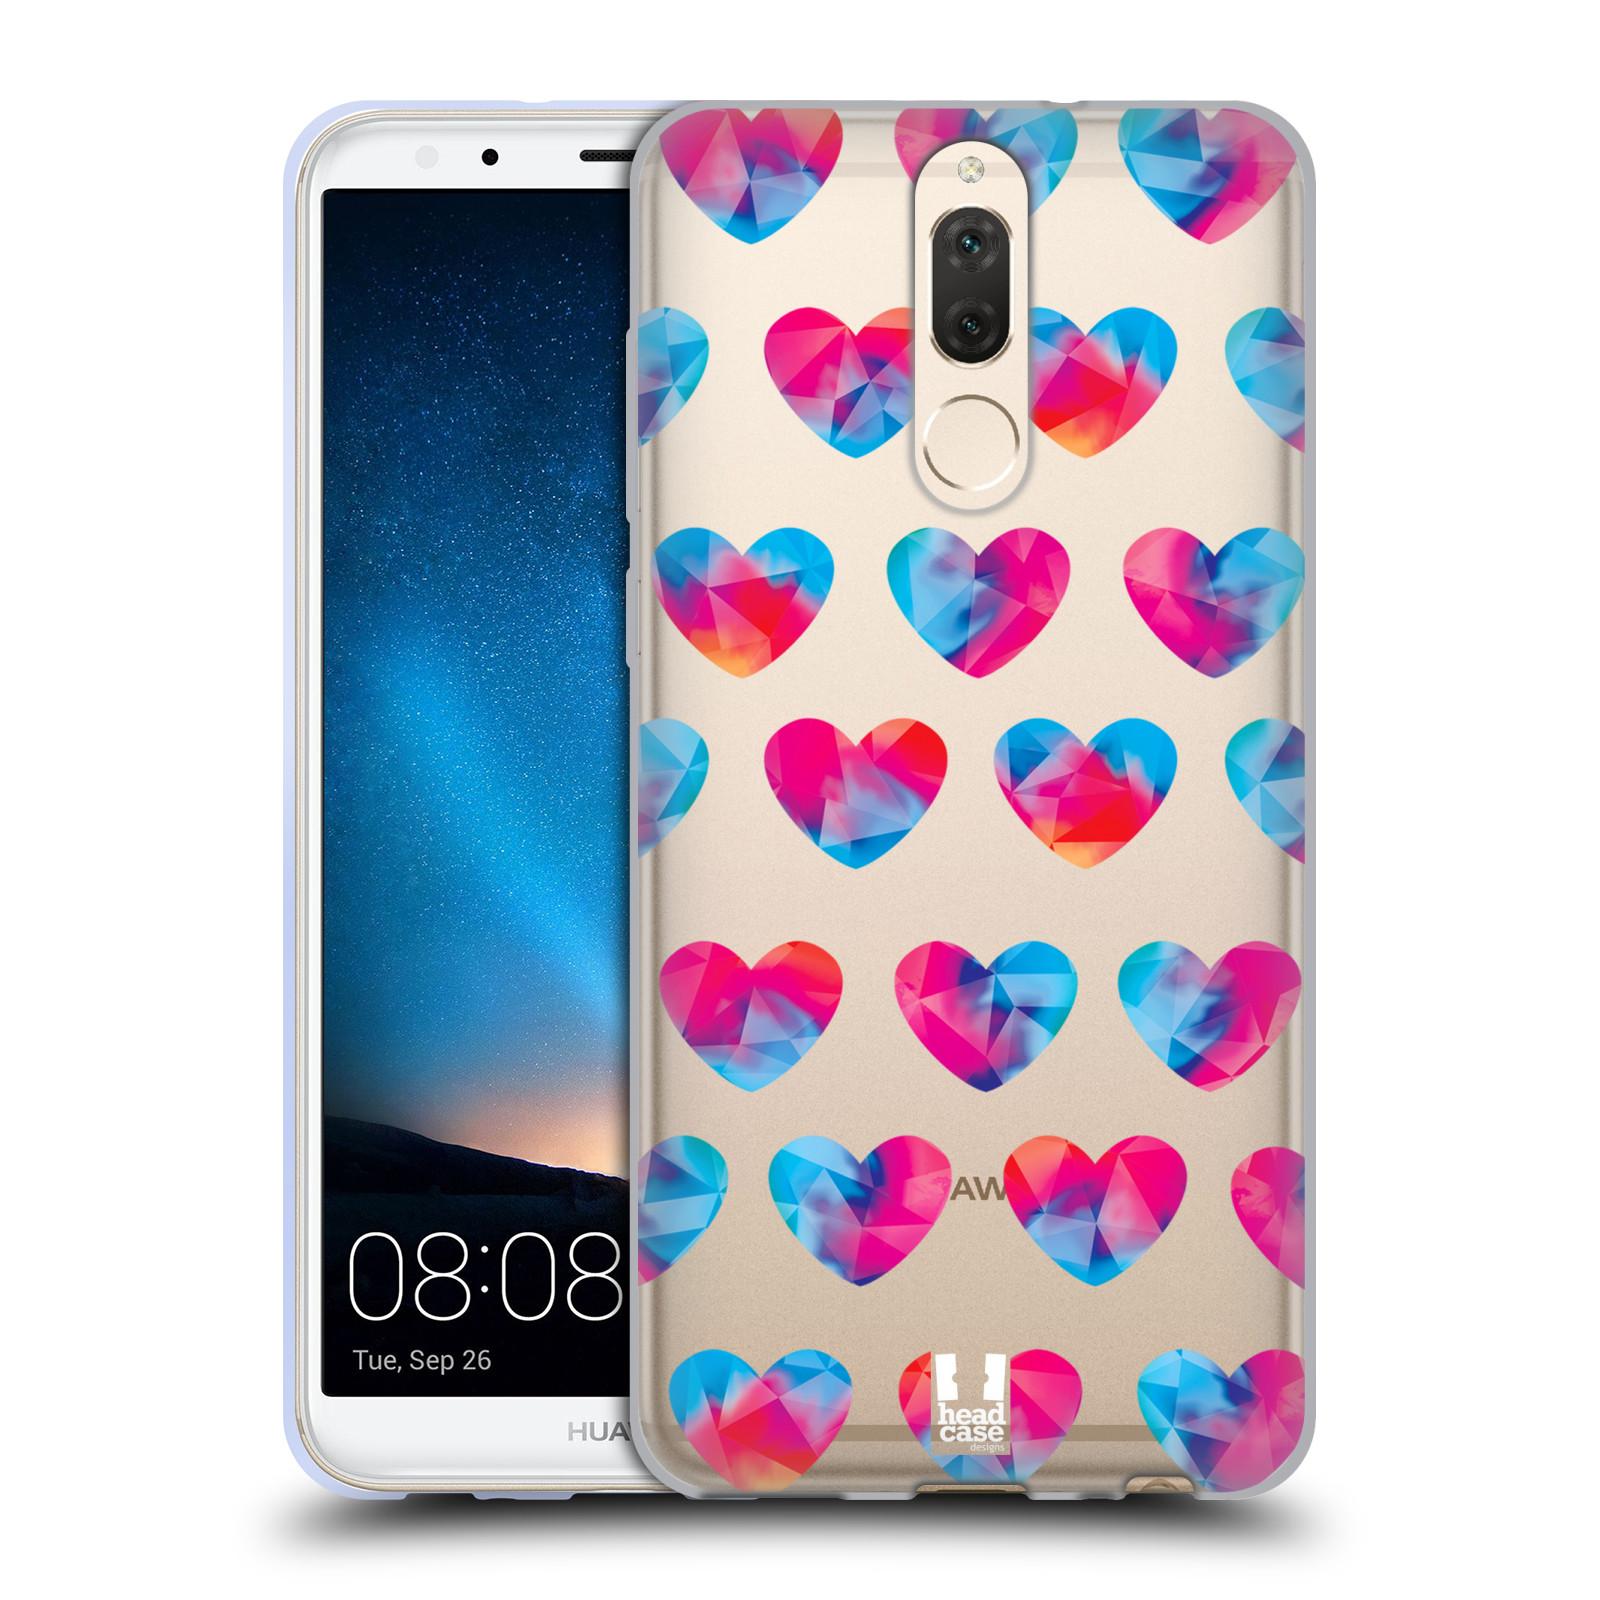 Silikonové pouzdro na mobil Huawei Mate 10 Lite - Head Case - Srdíčka hrající barvami